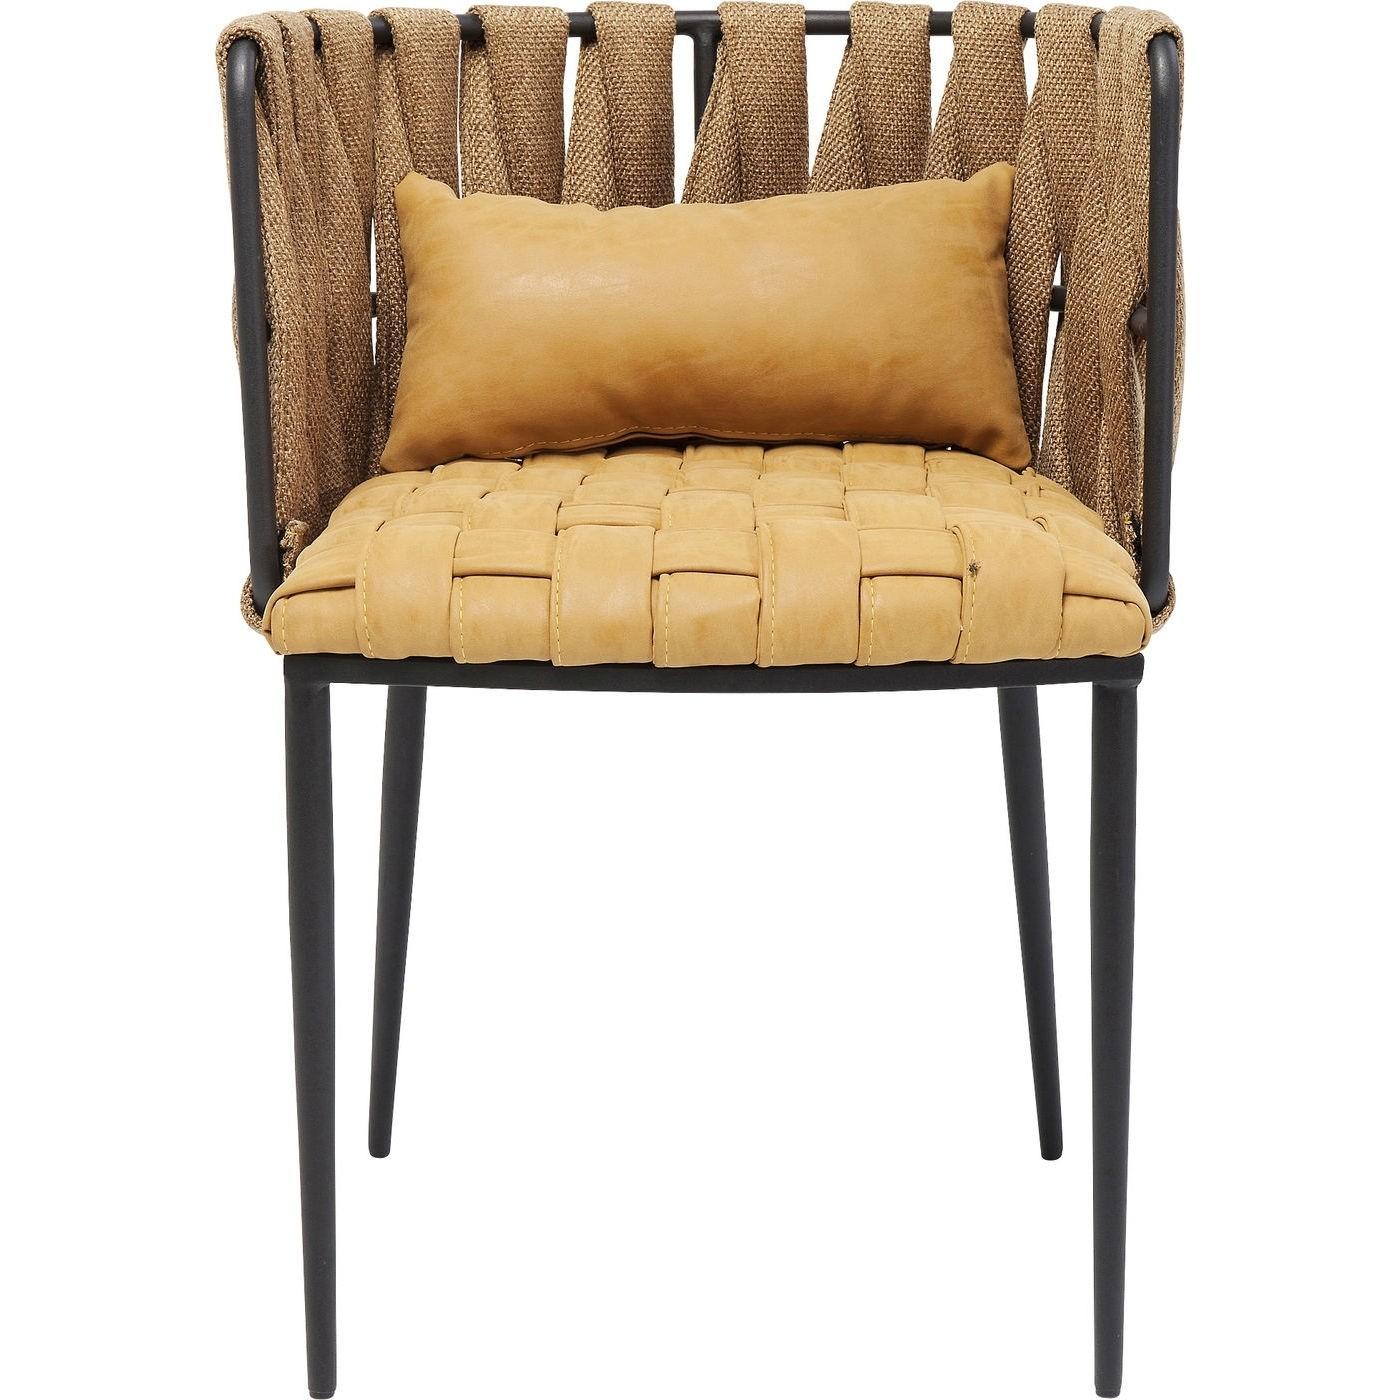 KARE DESIGN Cheerio spisebordsstol med armlæn - gult stof, inkl. pude thumbnail